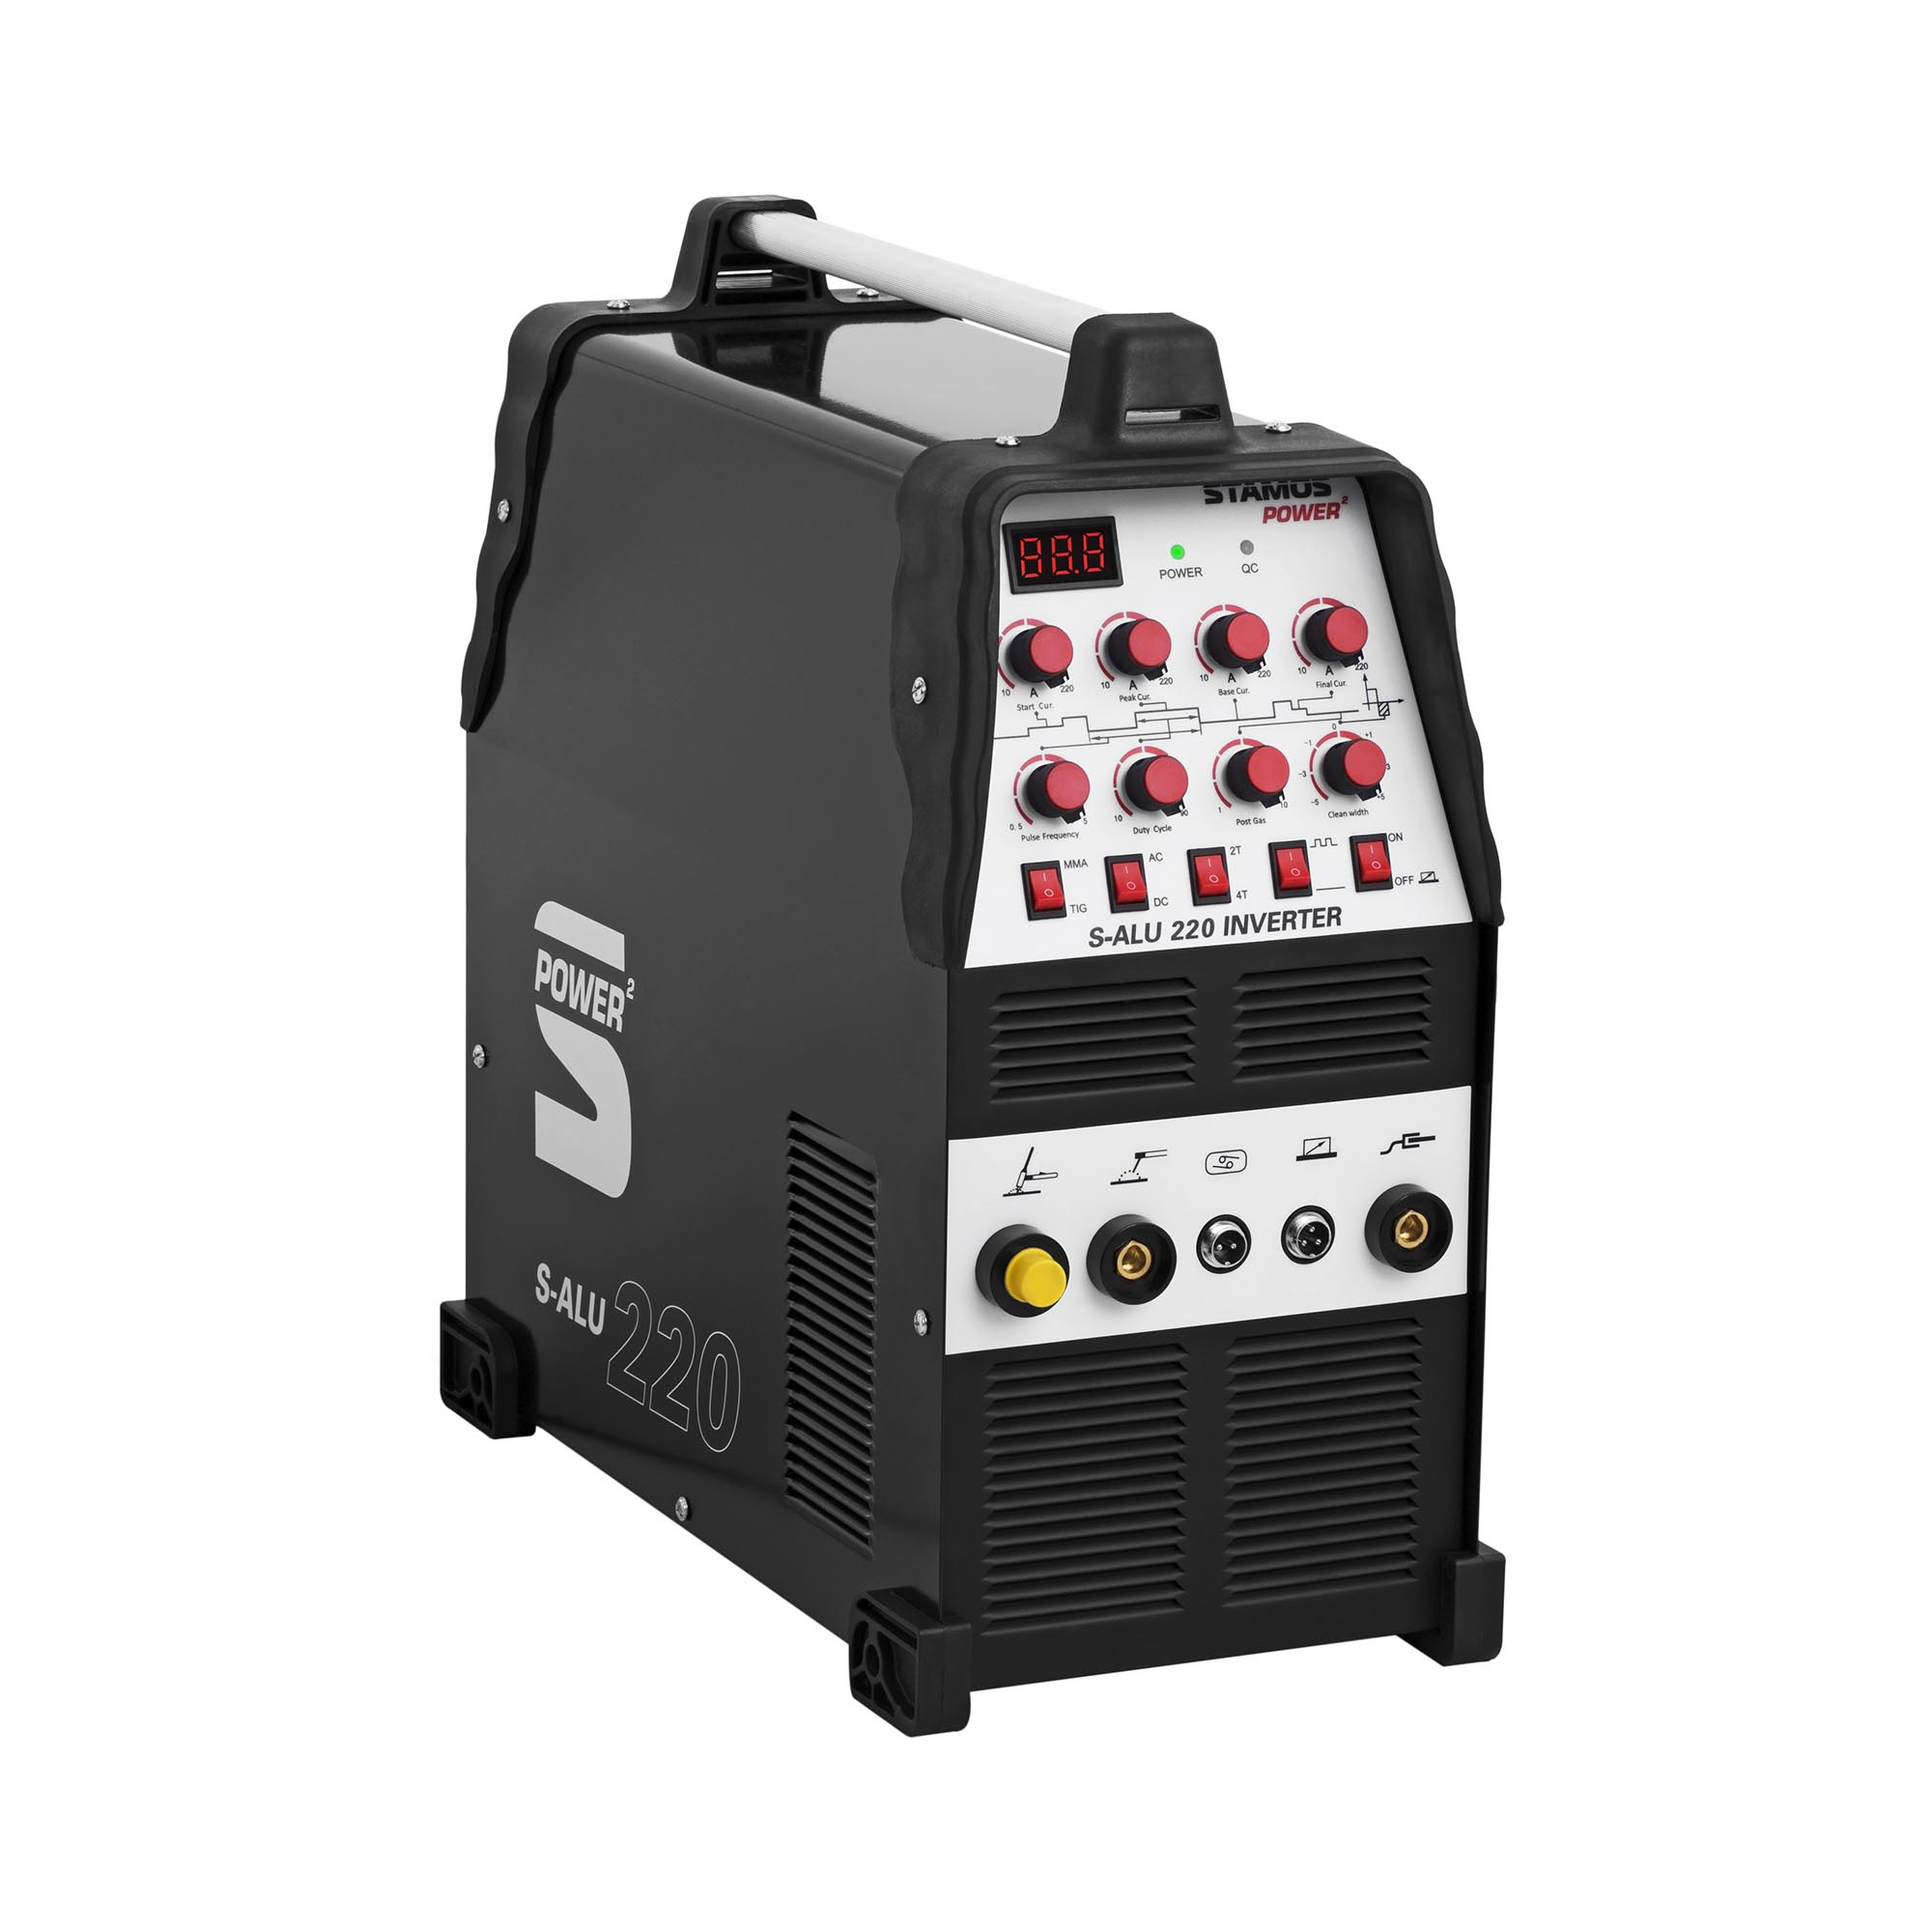 Stamos Power ² ALU Schweißgerät - WIG AC/DC - 220 A - 230 V - Puls - 2/4 Takt 10020125